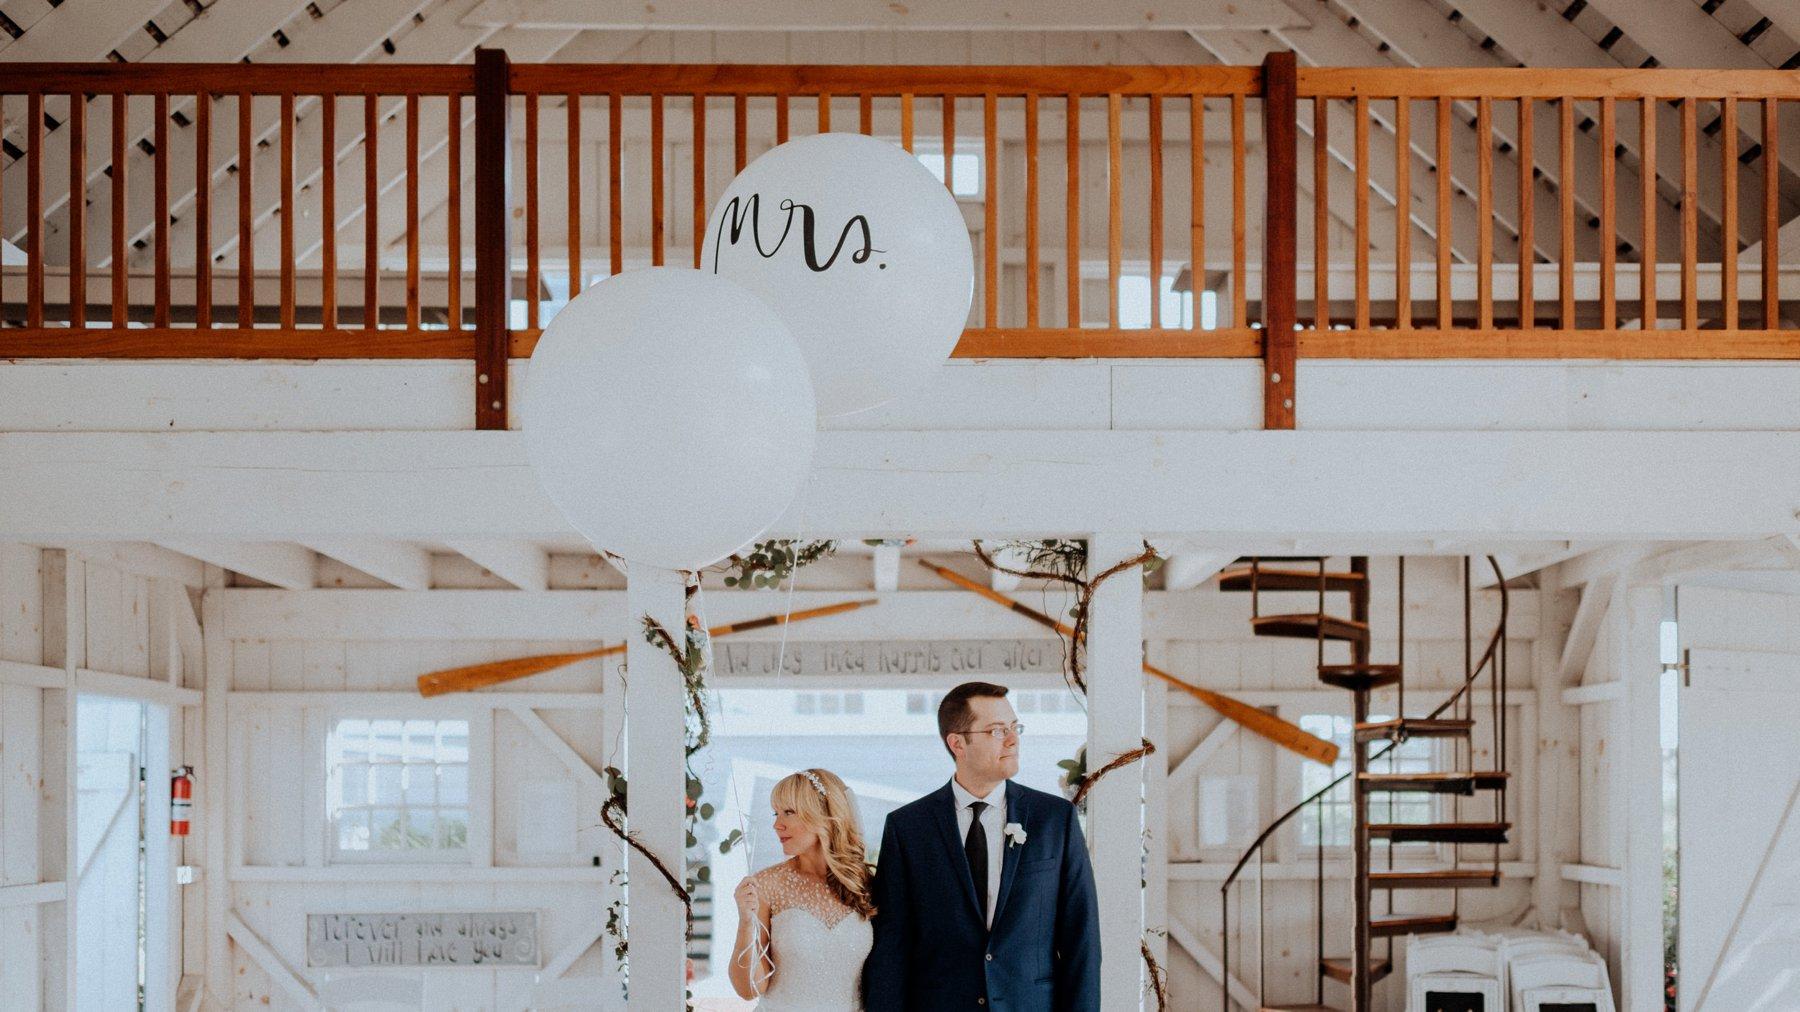 223-220-bonnet-island-estate-wedding-8.jpg